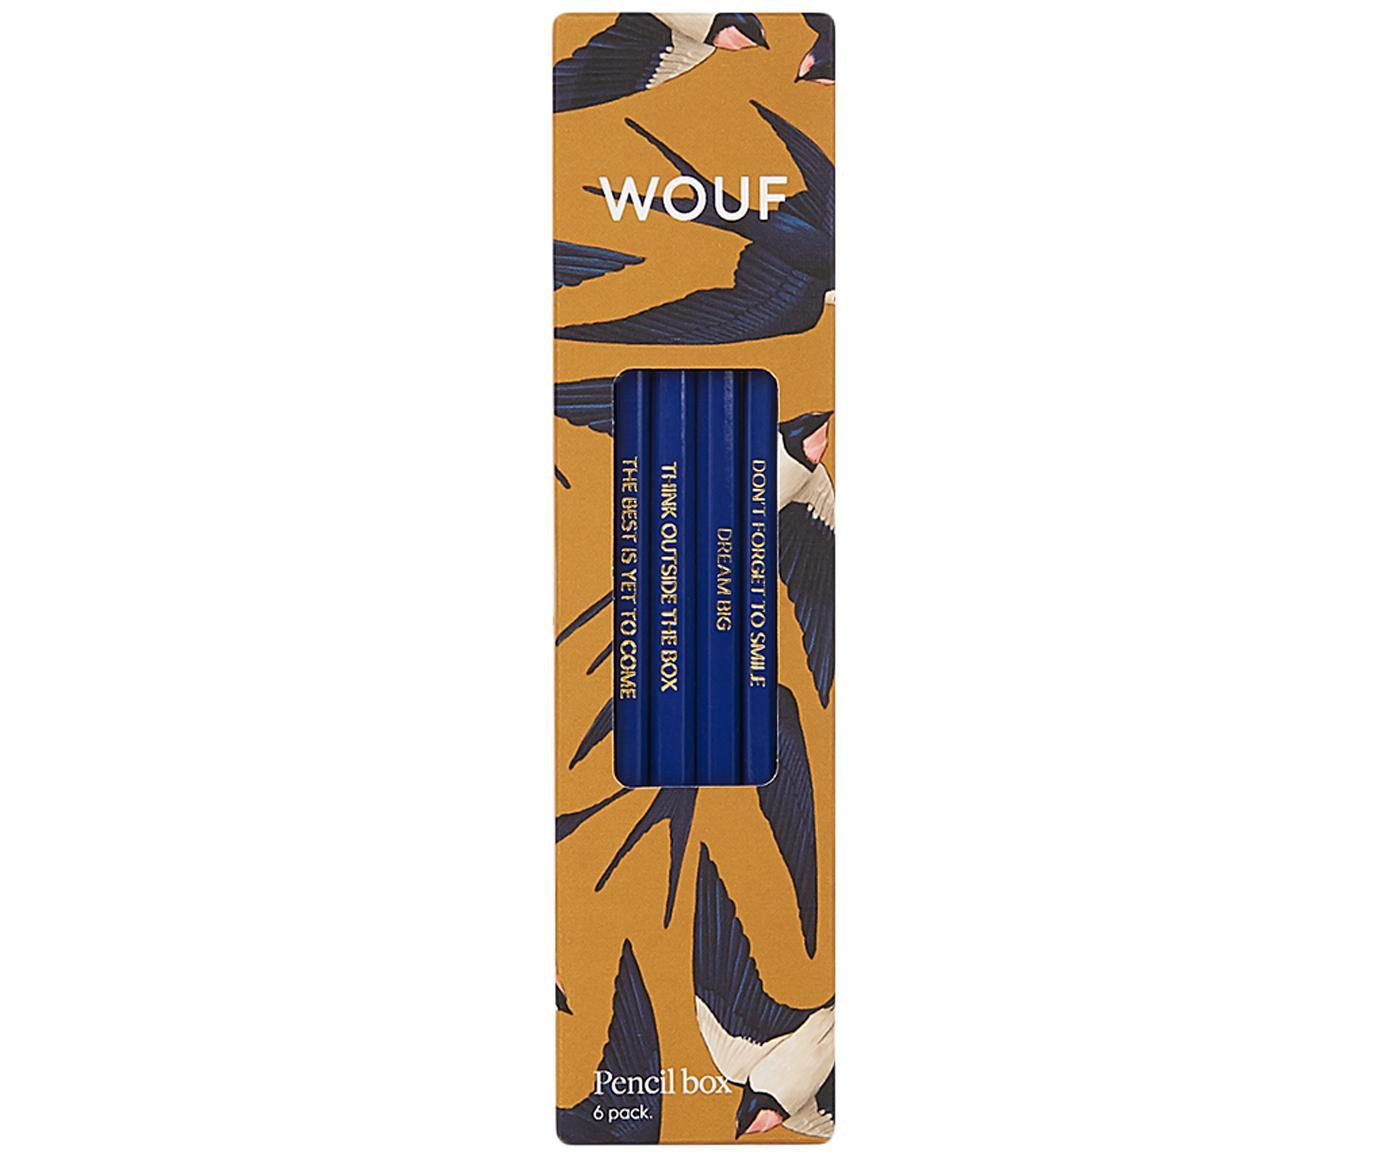 Bleistift-Set Swallow, 6-tlg., Holz, Gelb, Blau, Beige, 18 x 5 cm